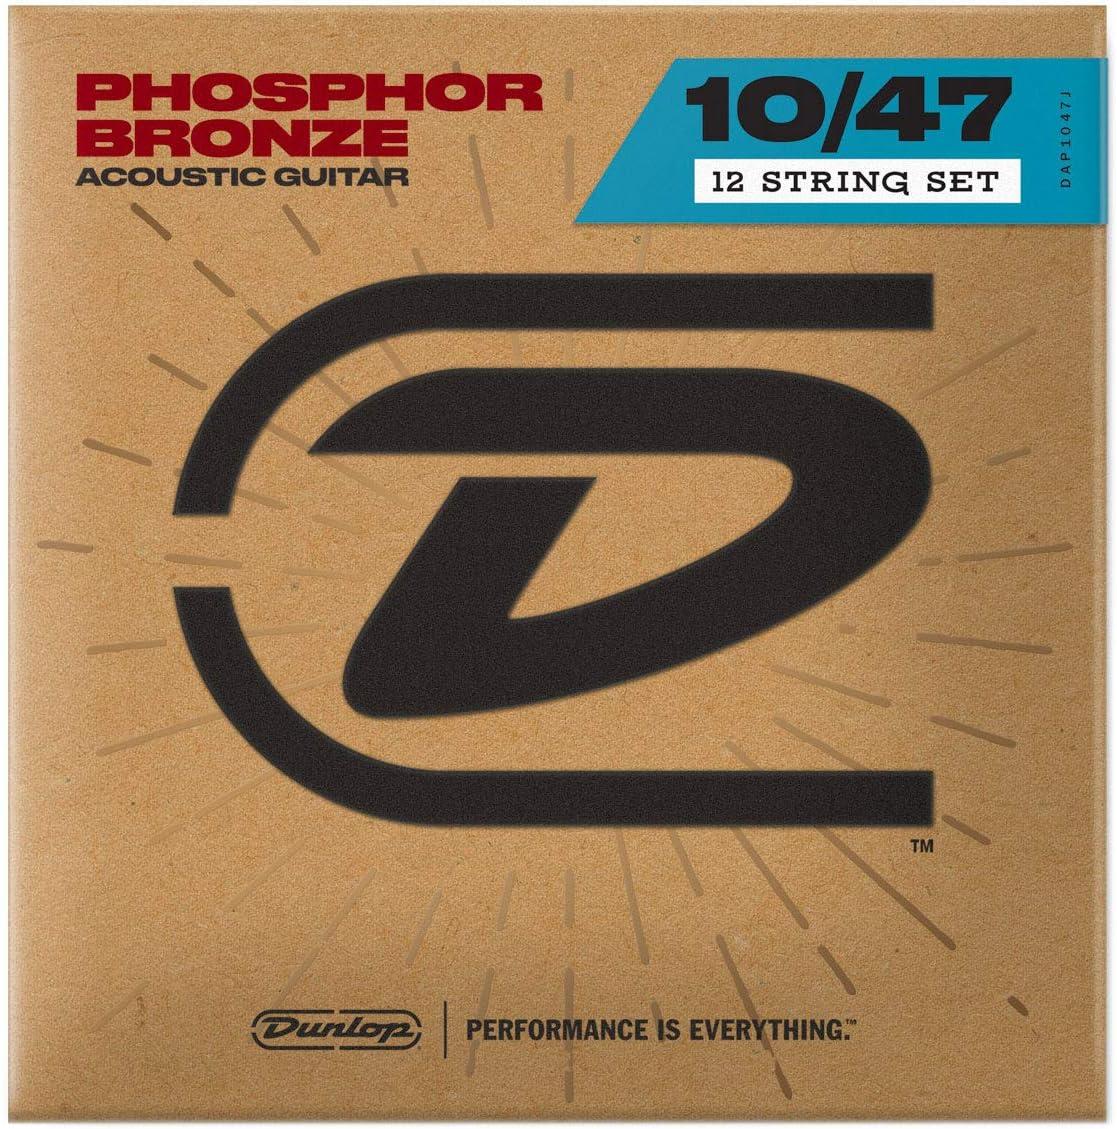 Dunlop DAP1047J Light Phosphor Bronze 0 Acoustic Challenge the Popular product lowest price Guitar Strings